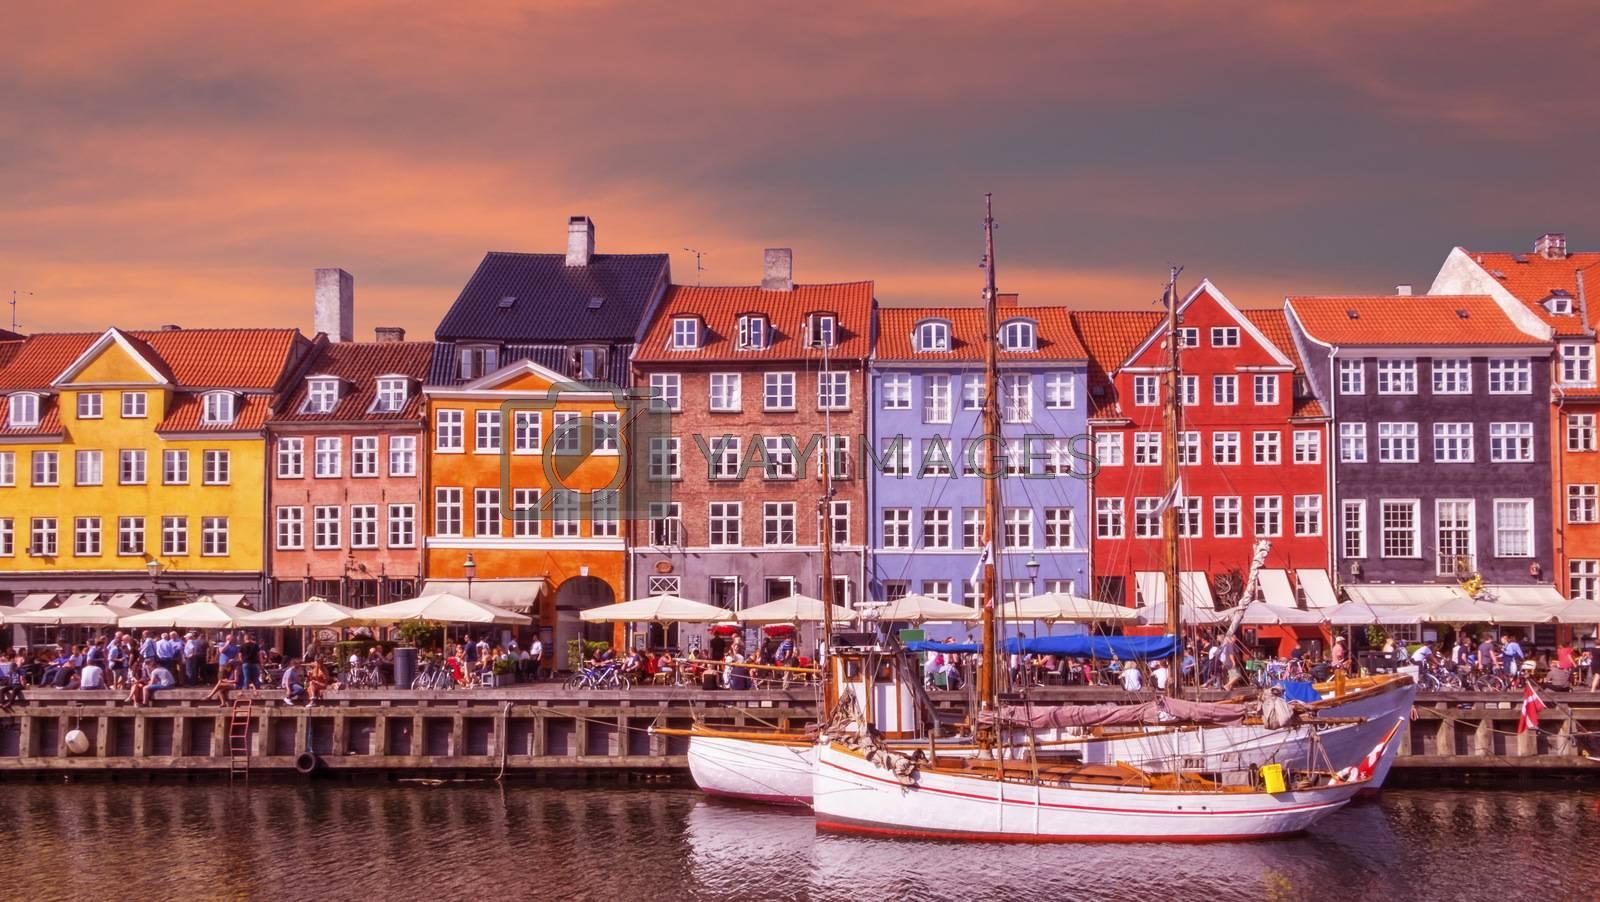 Scenic summer view of color buildings and boats of Nyhavn in Copenhagen, Denmark